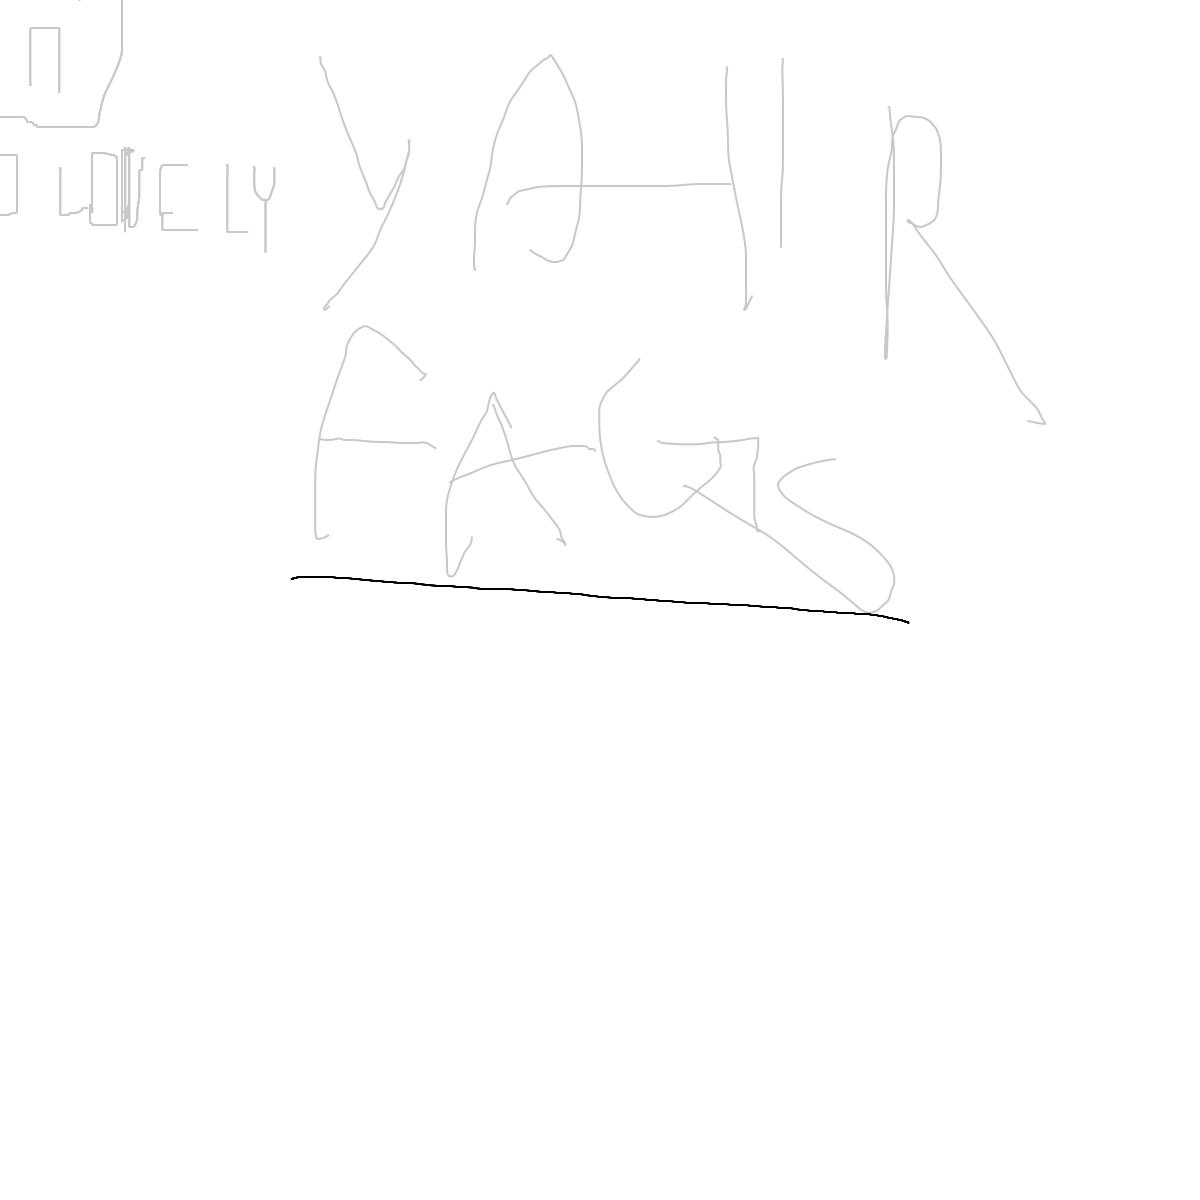 BAAAM drawing#15745 lat:51.0461273193359400lng: -114.0773086547851600